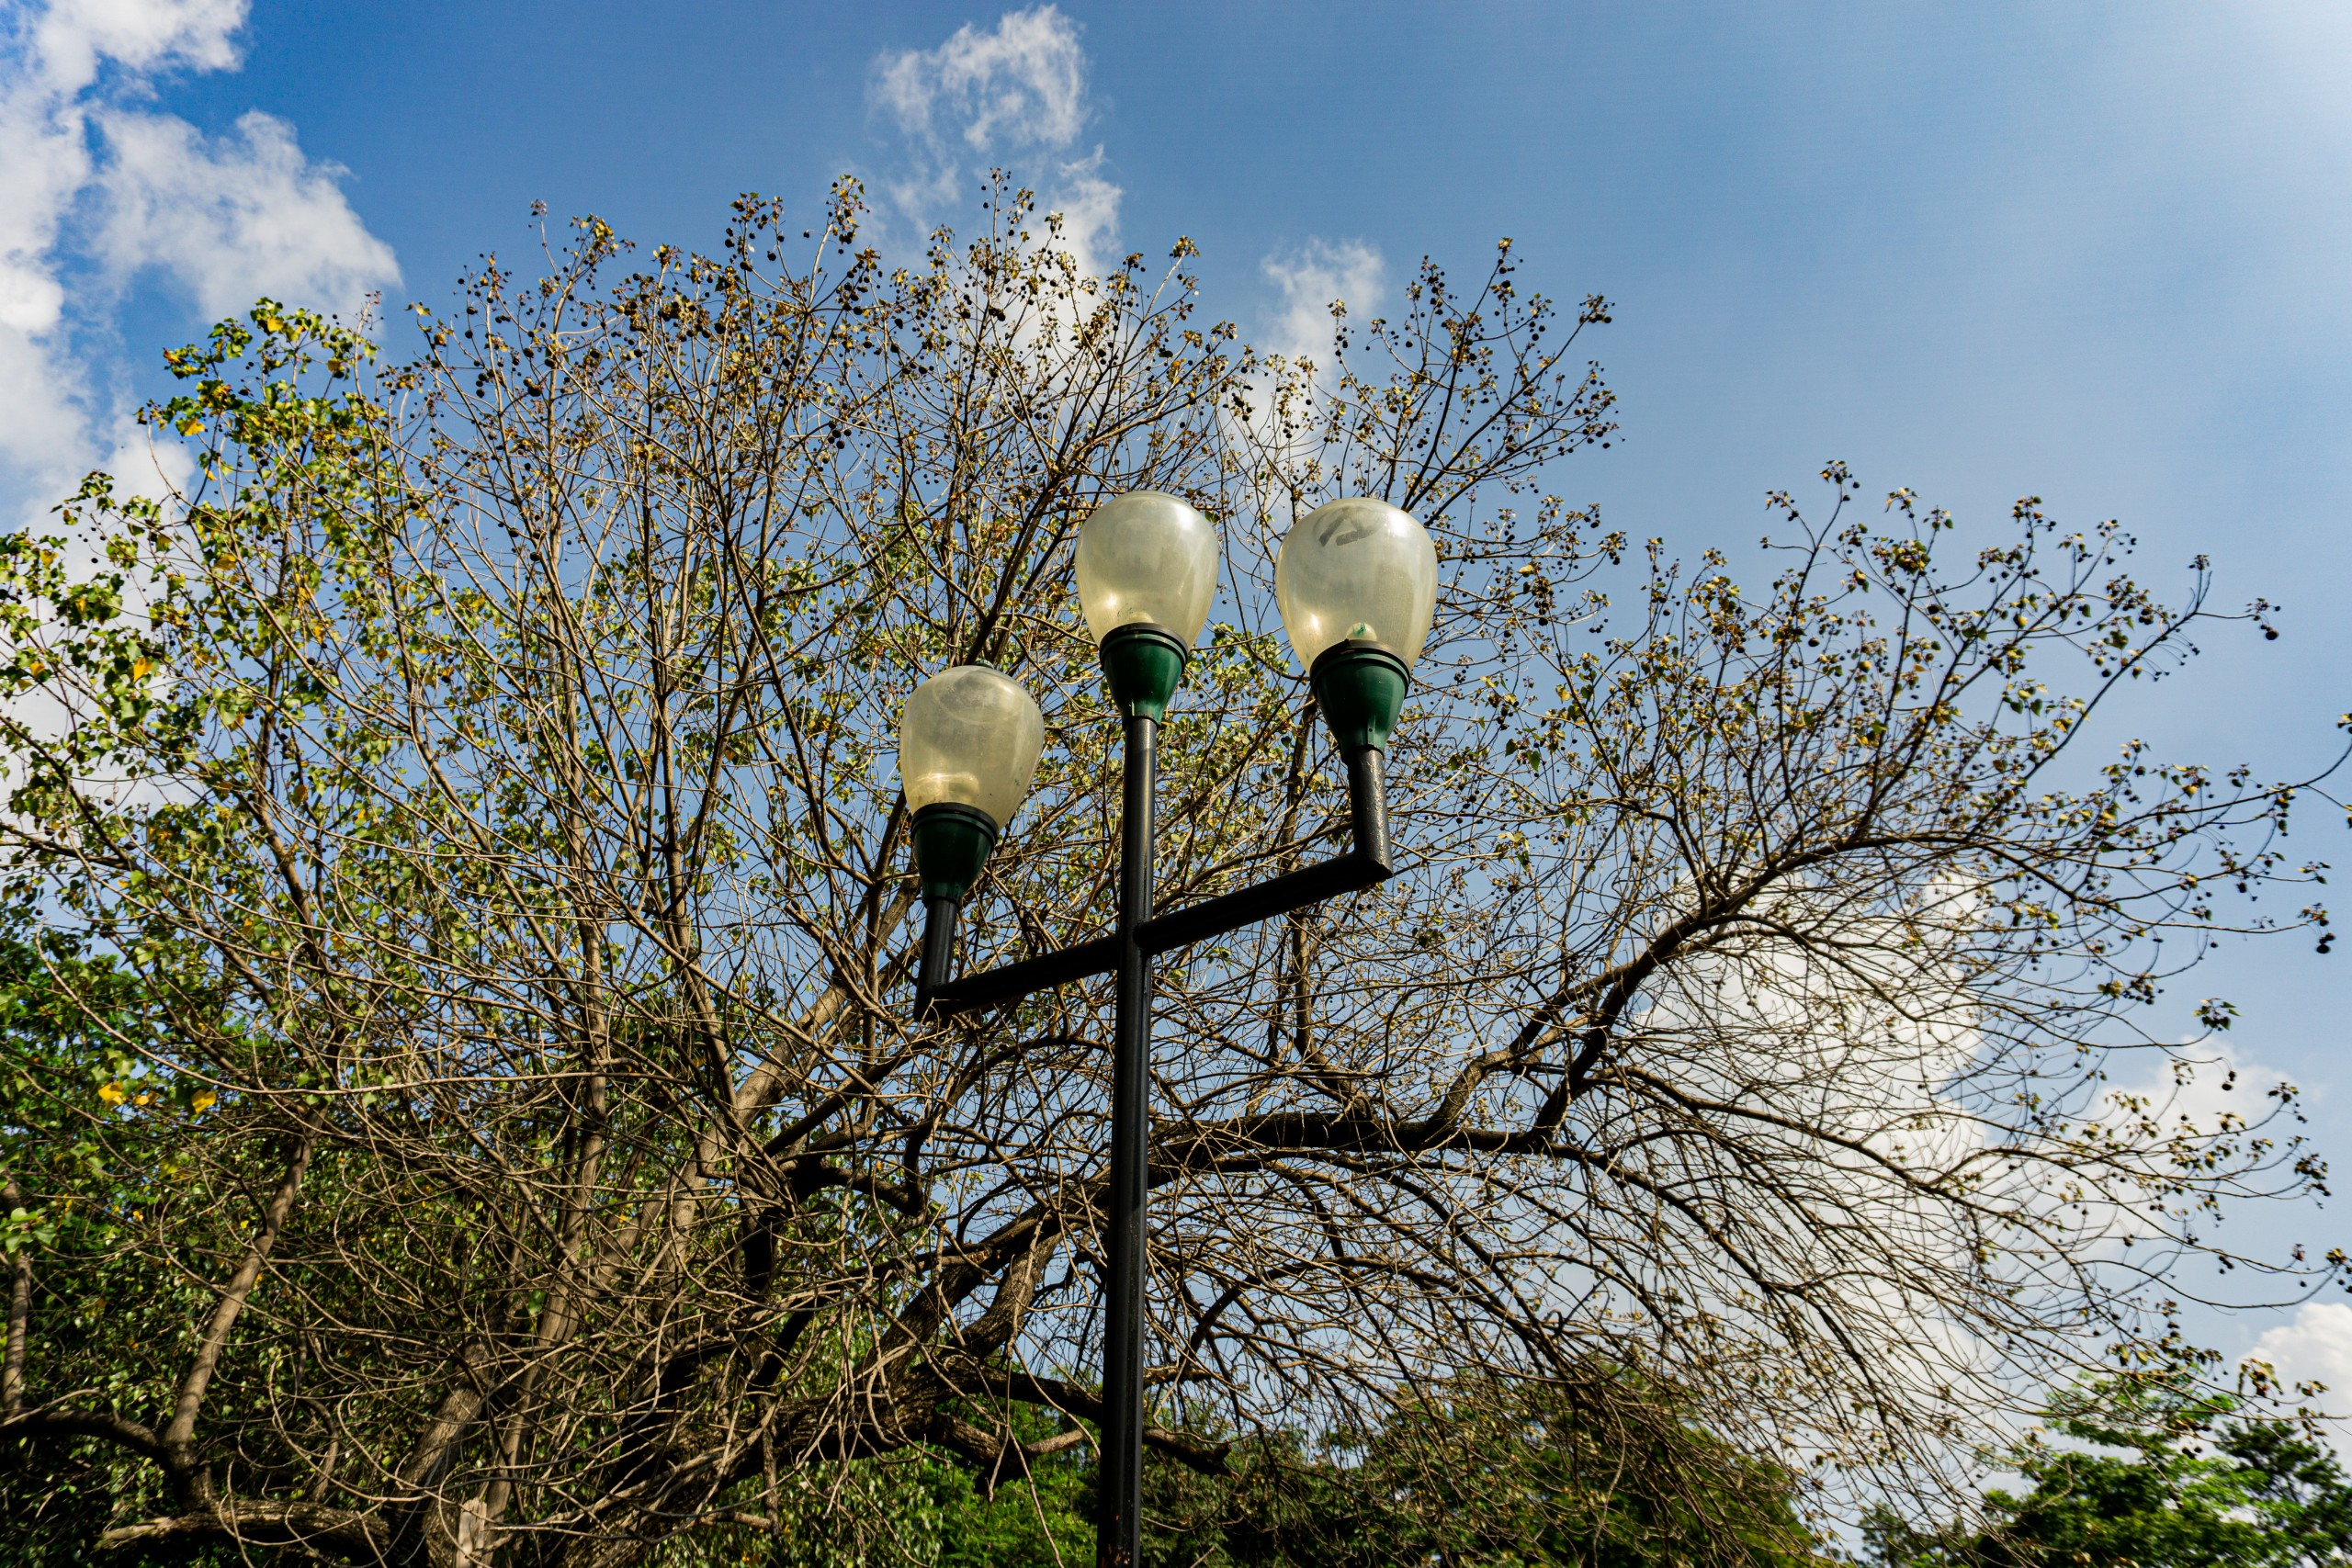 Lamp post on the street